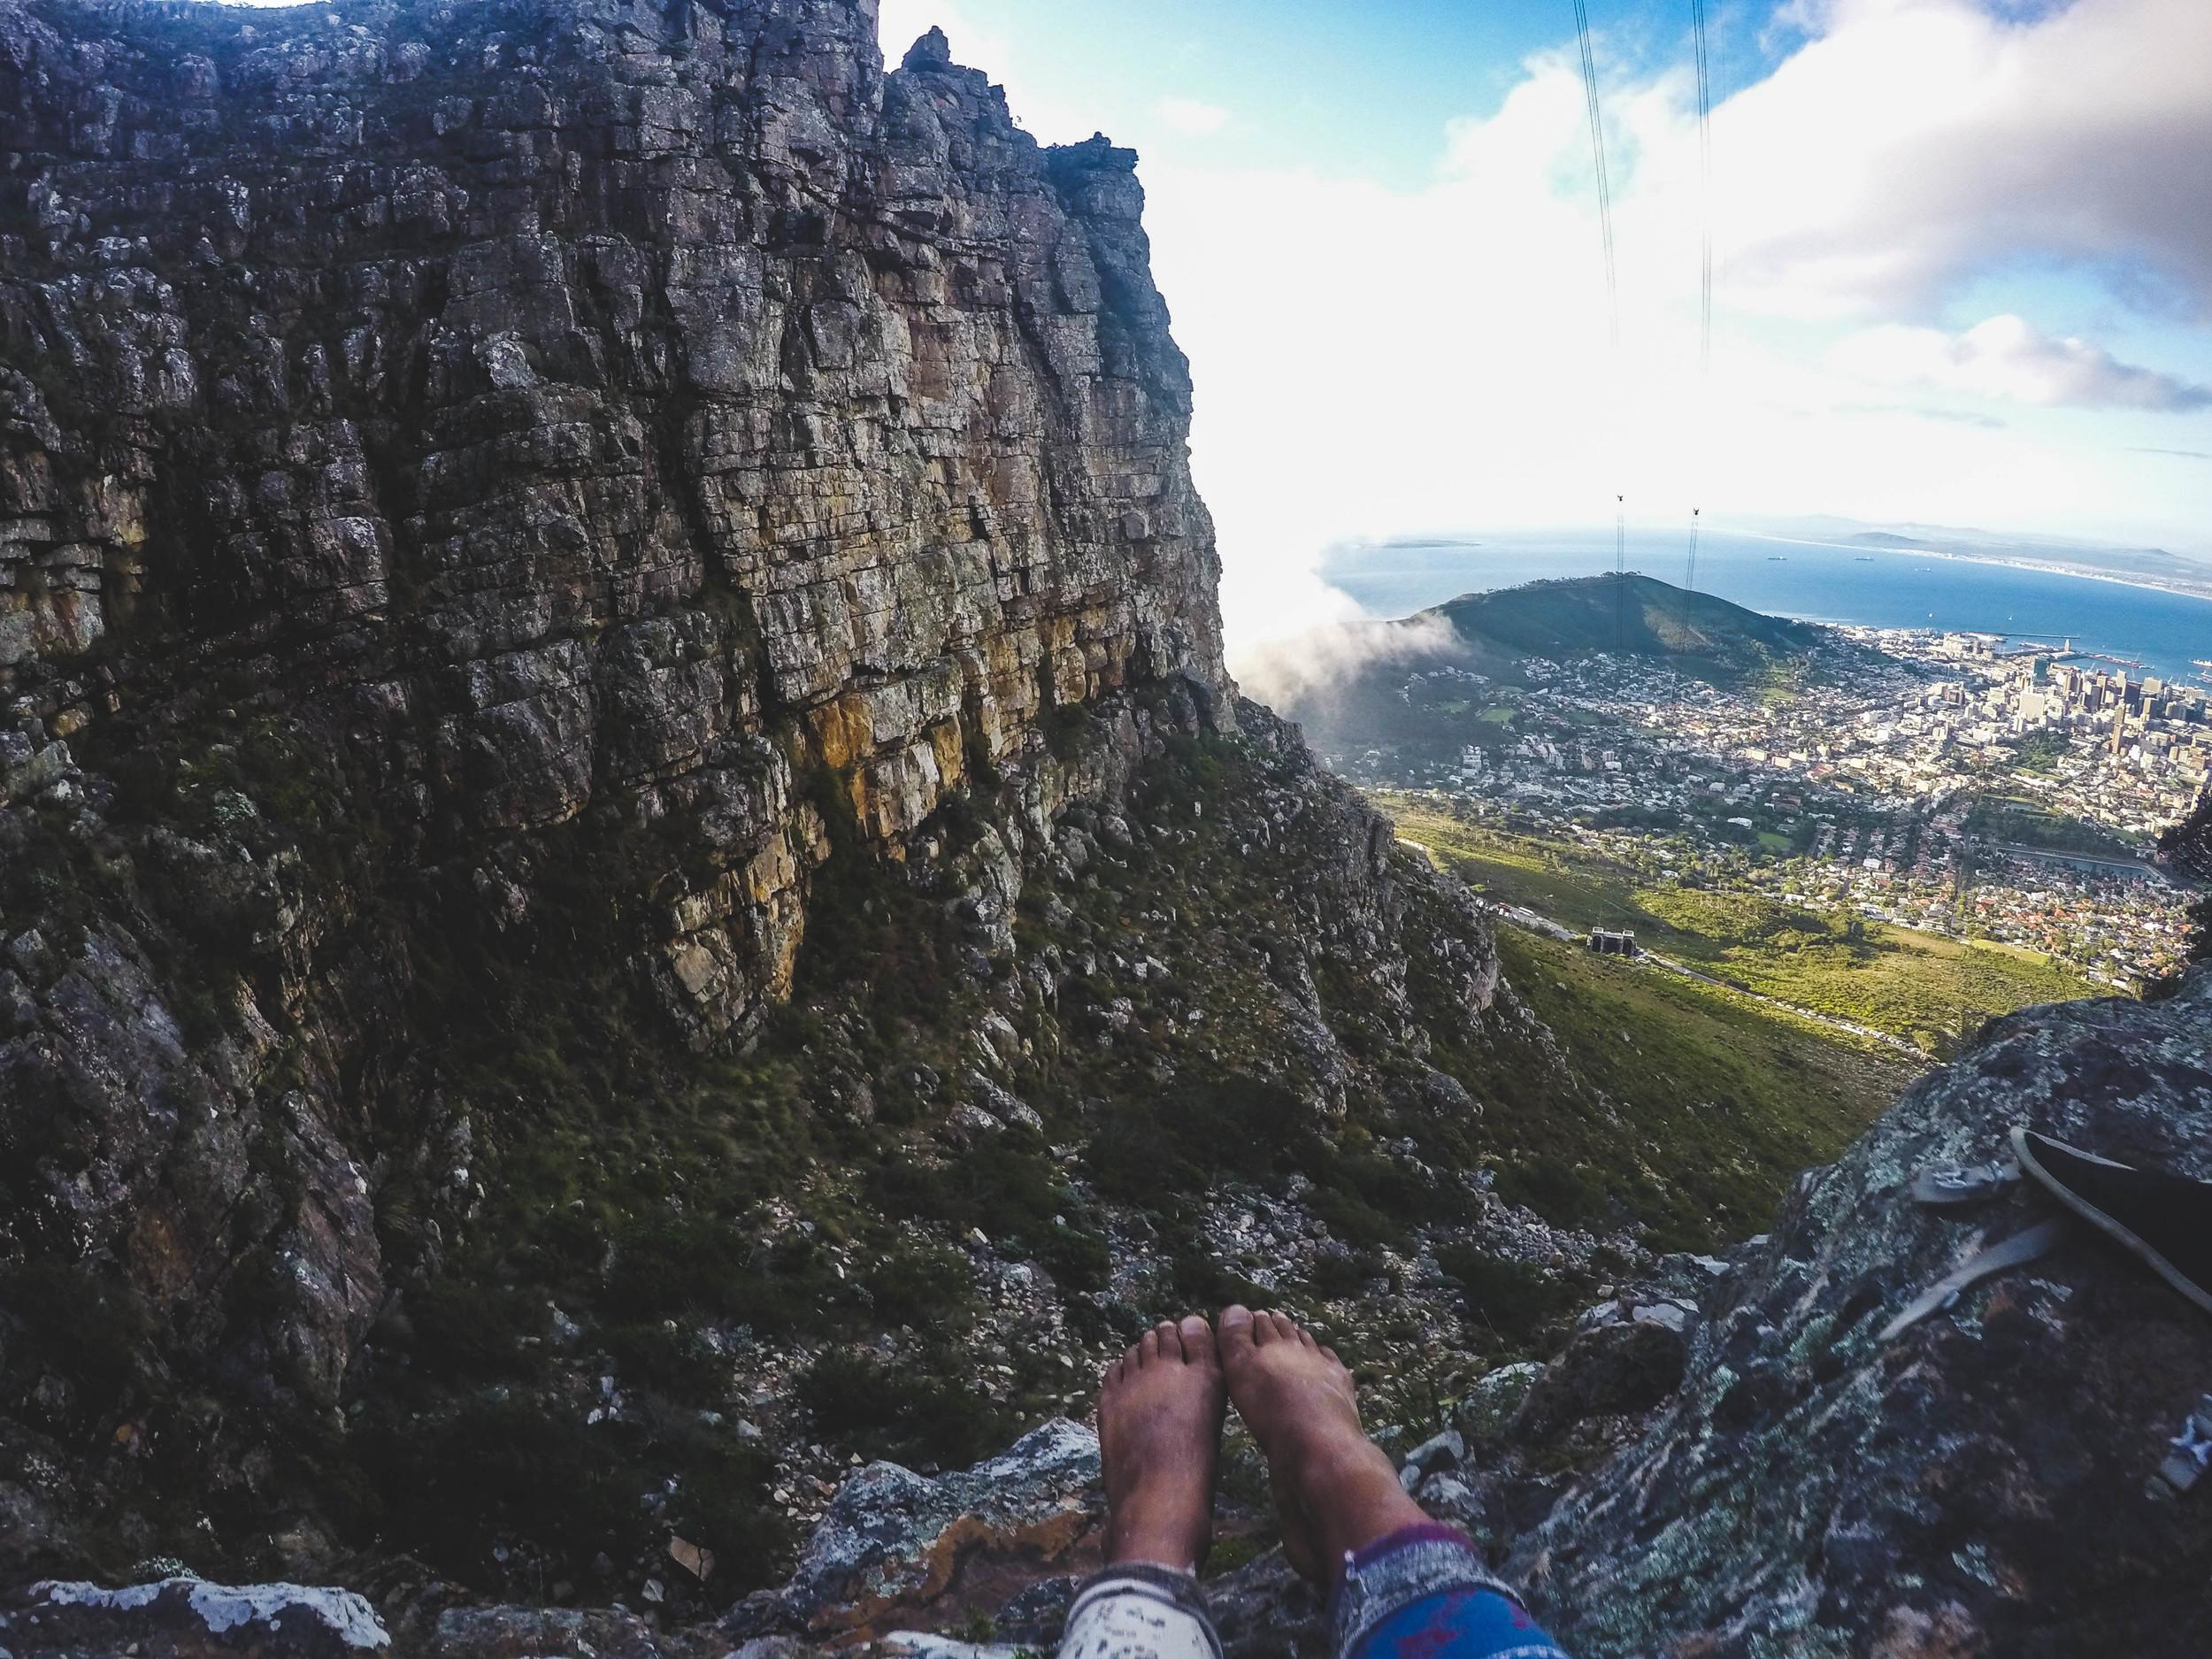 Proper hiking shoes